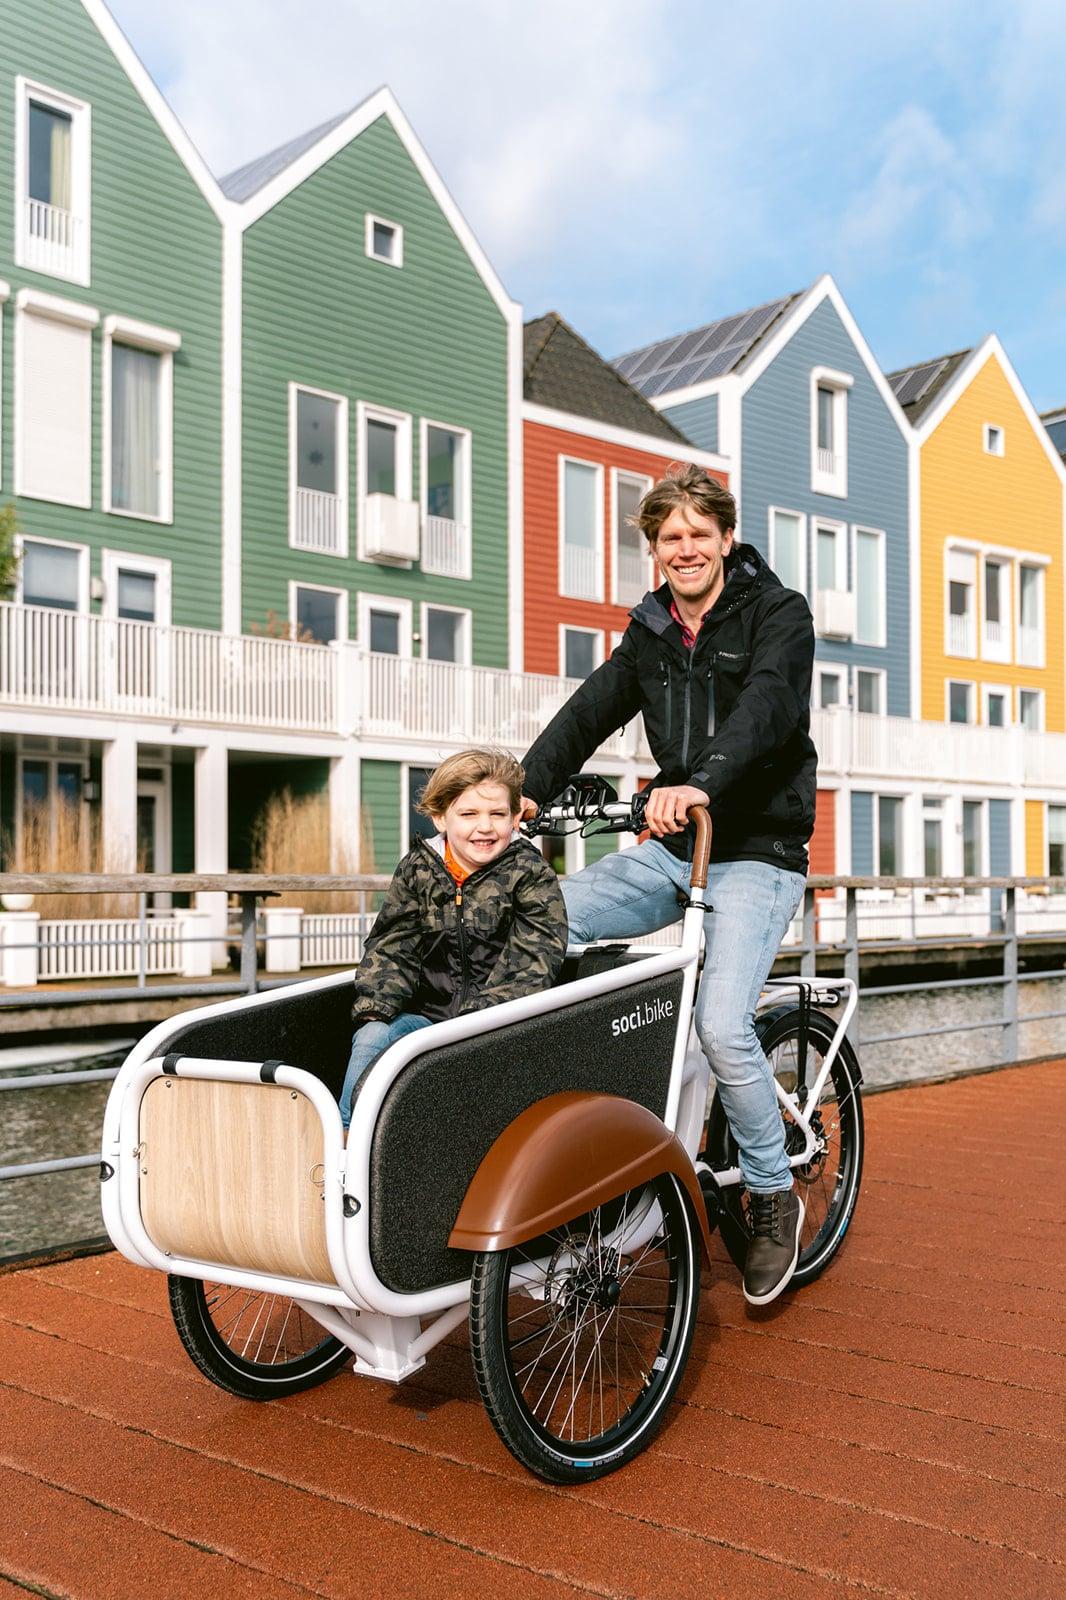 Over soci.bike ambassadeur Van Dijk Bikes